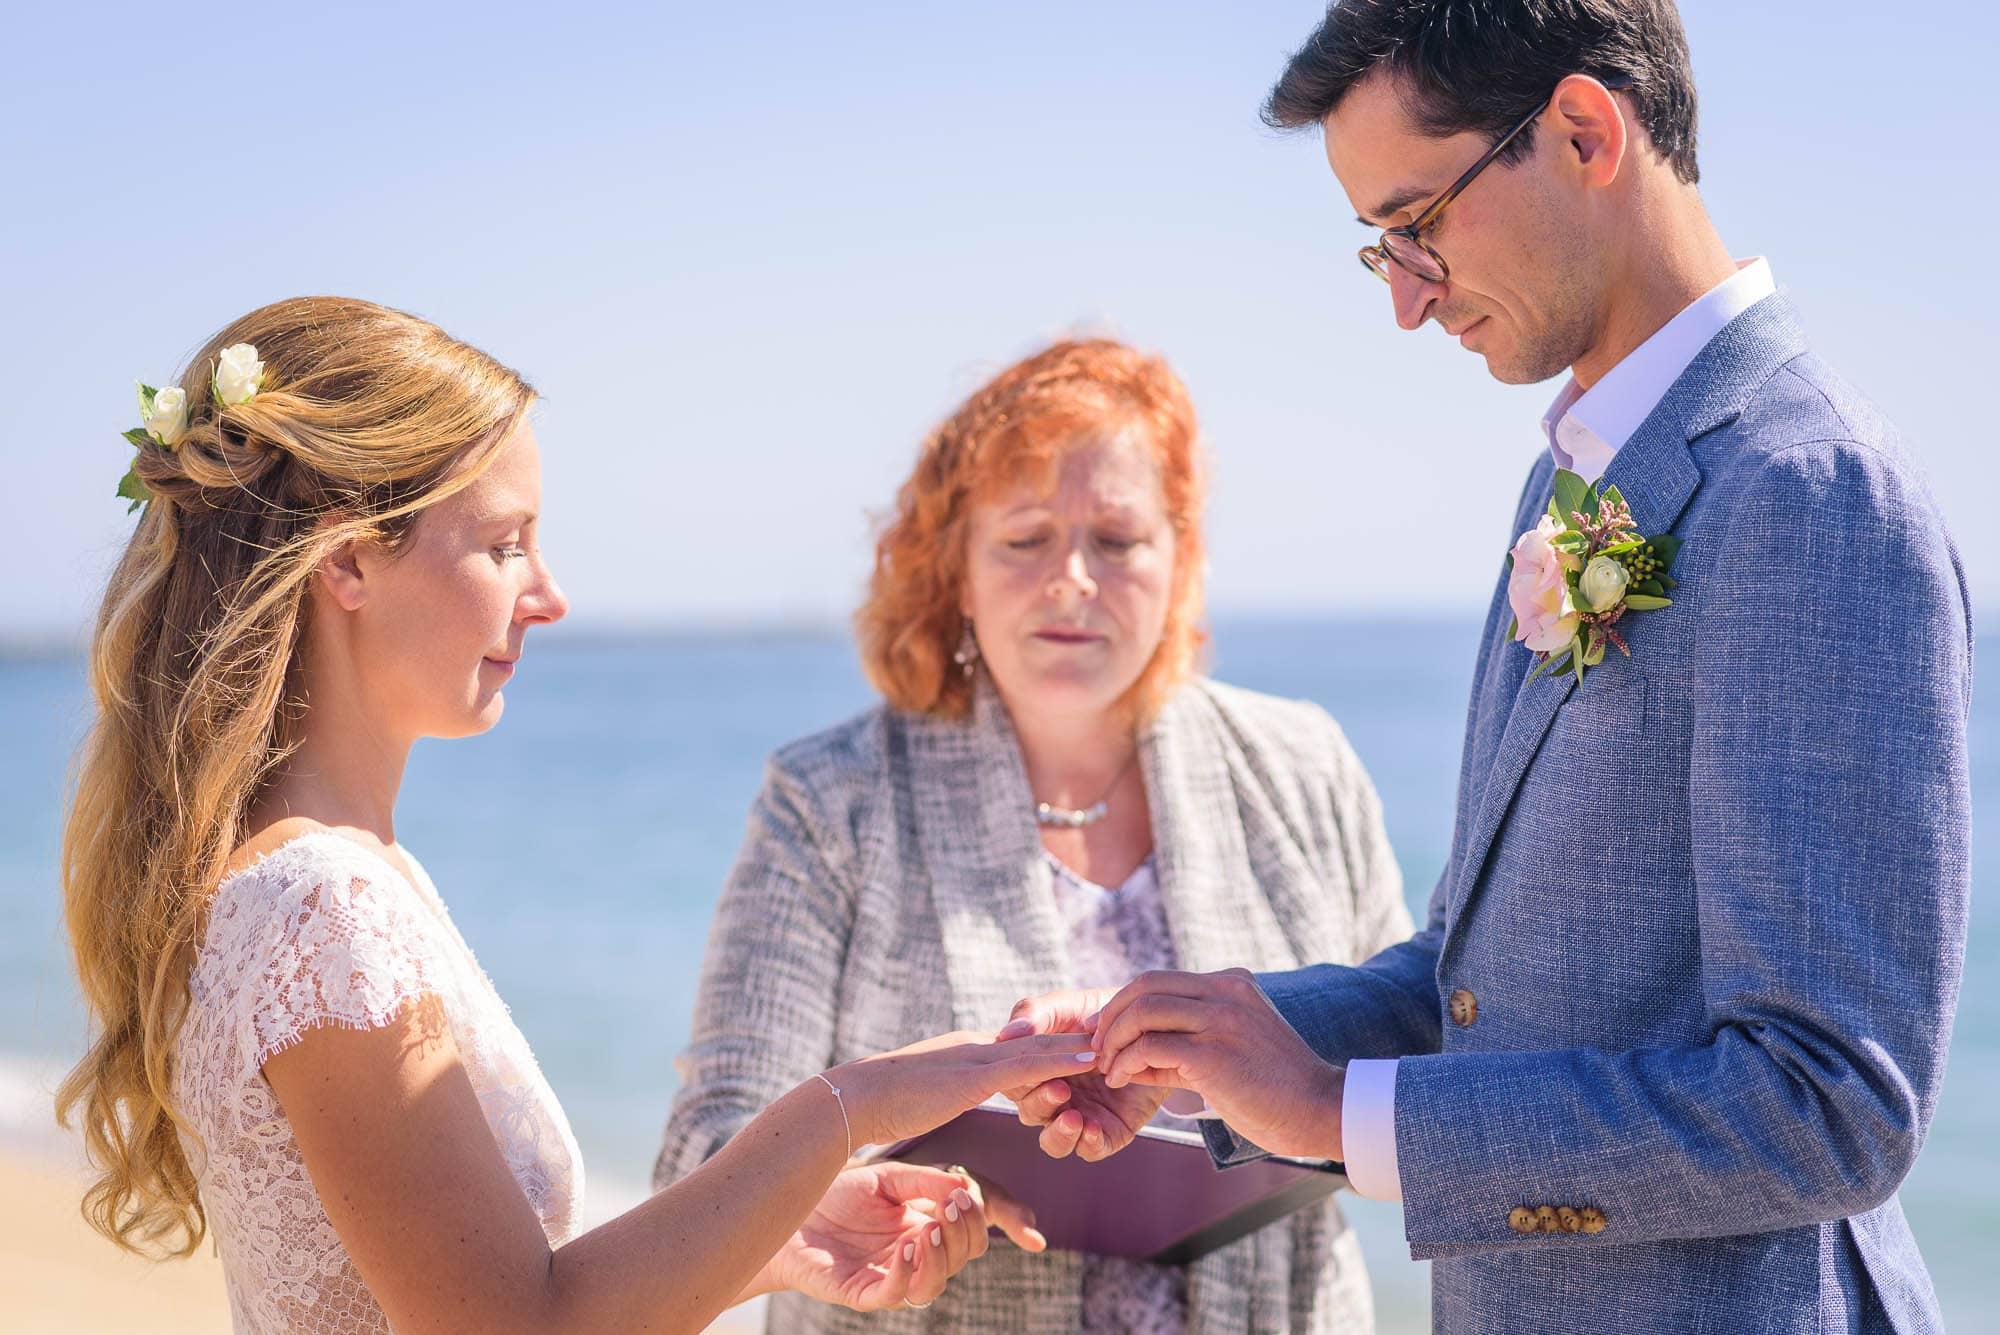 024_Alan_and_Heidi_Wedding_Verena_Andreas